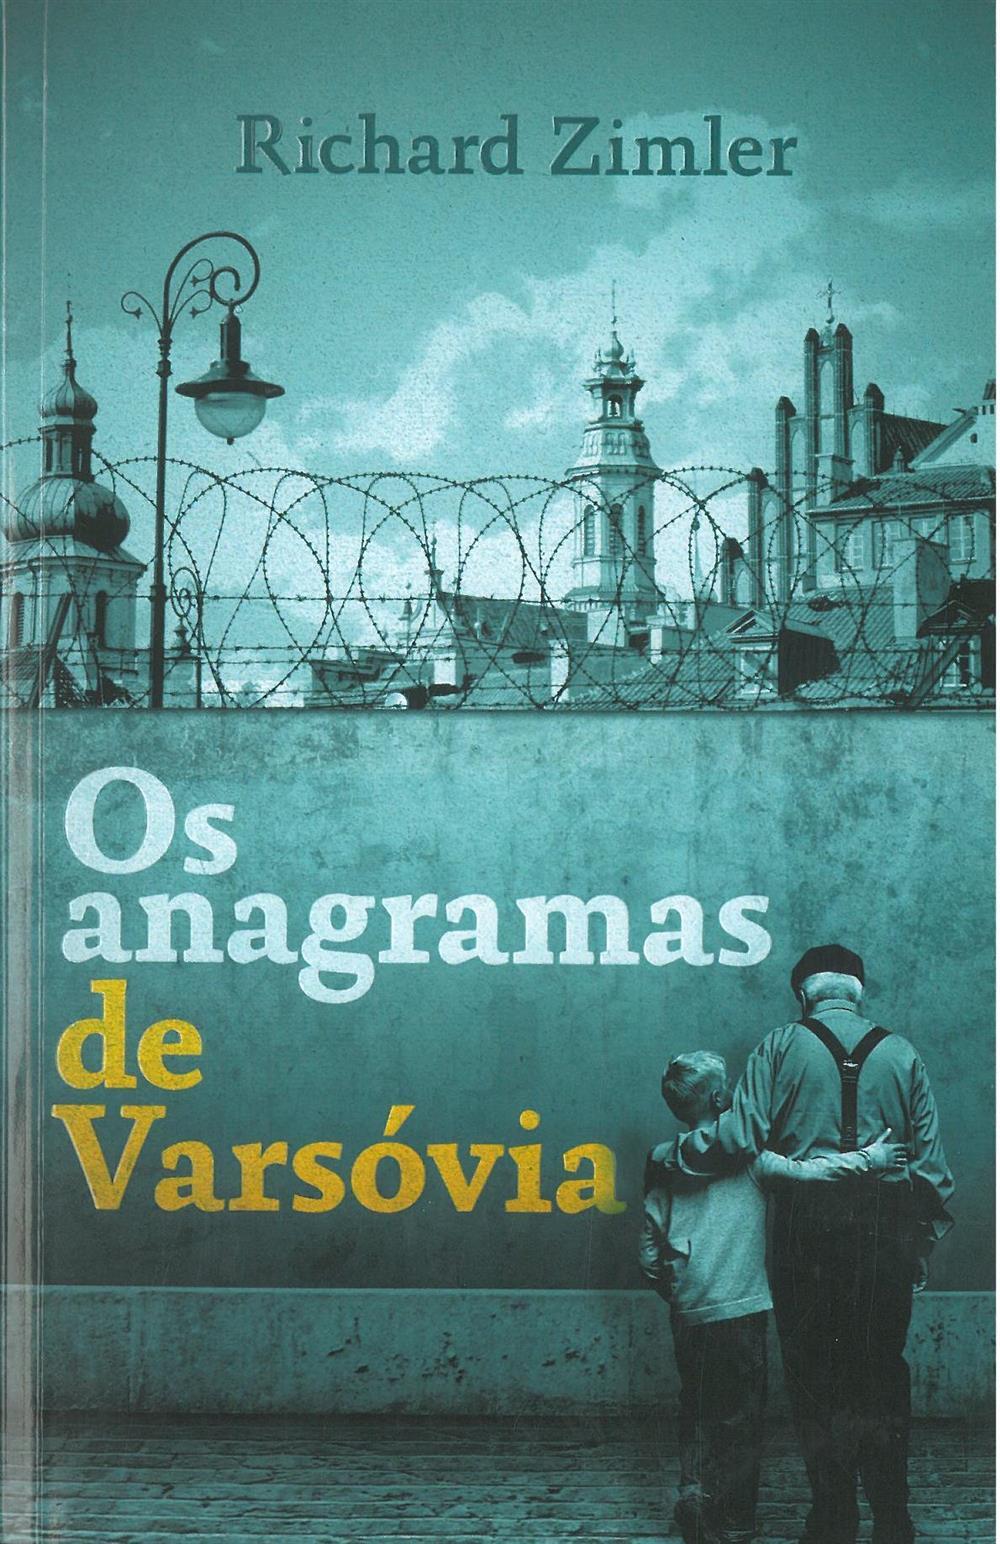 Os anagramas de Varsóvia_.jpg